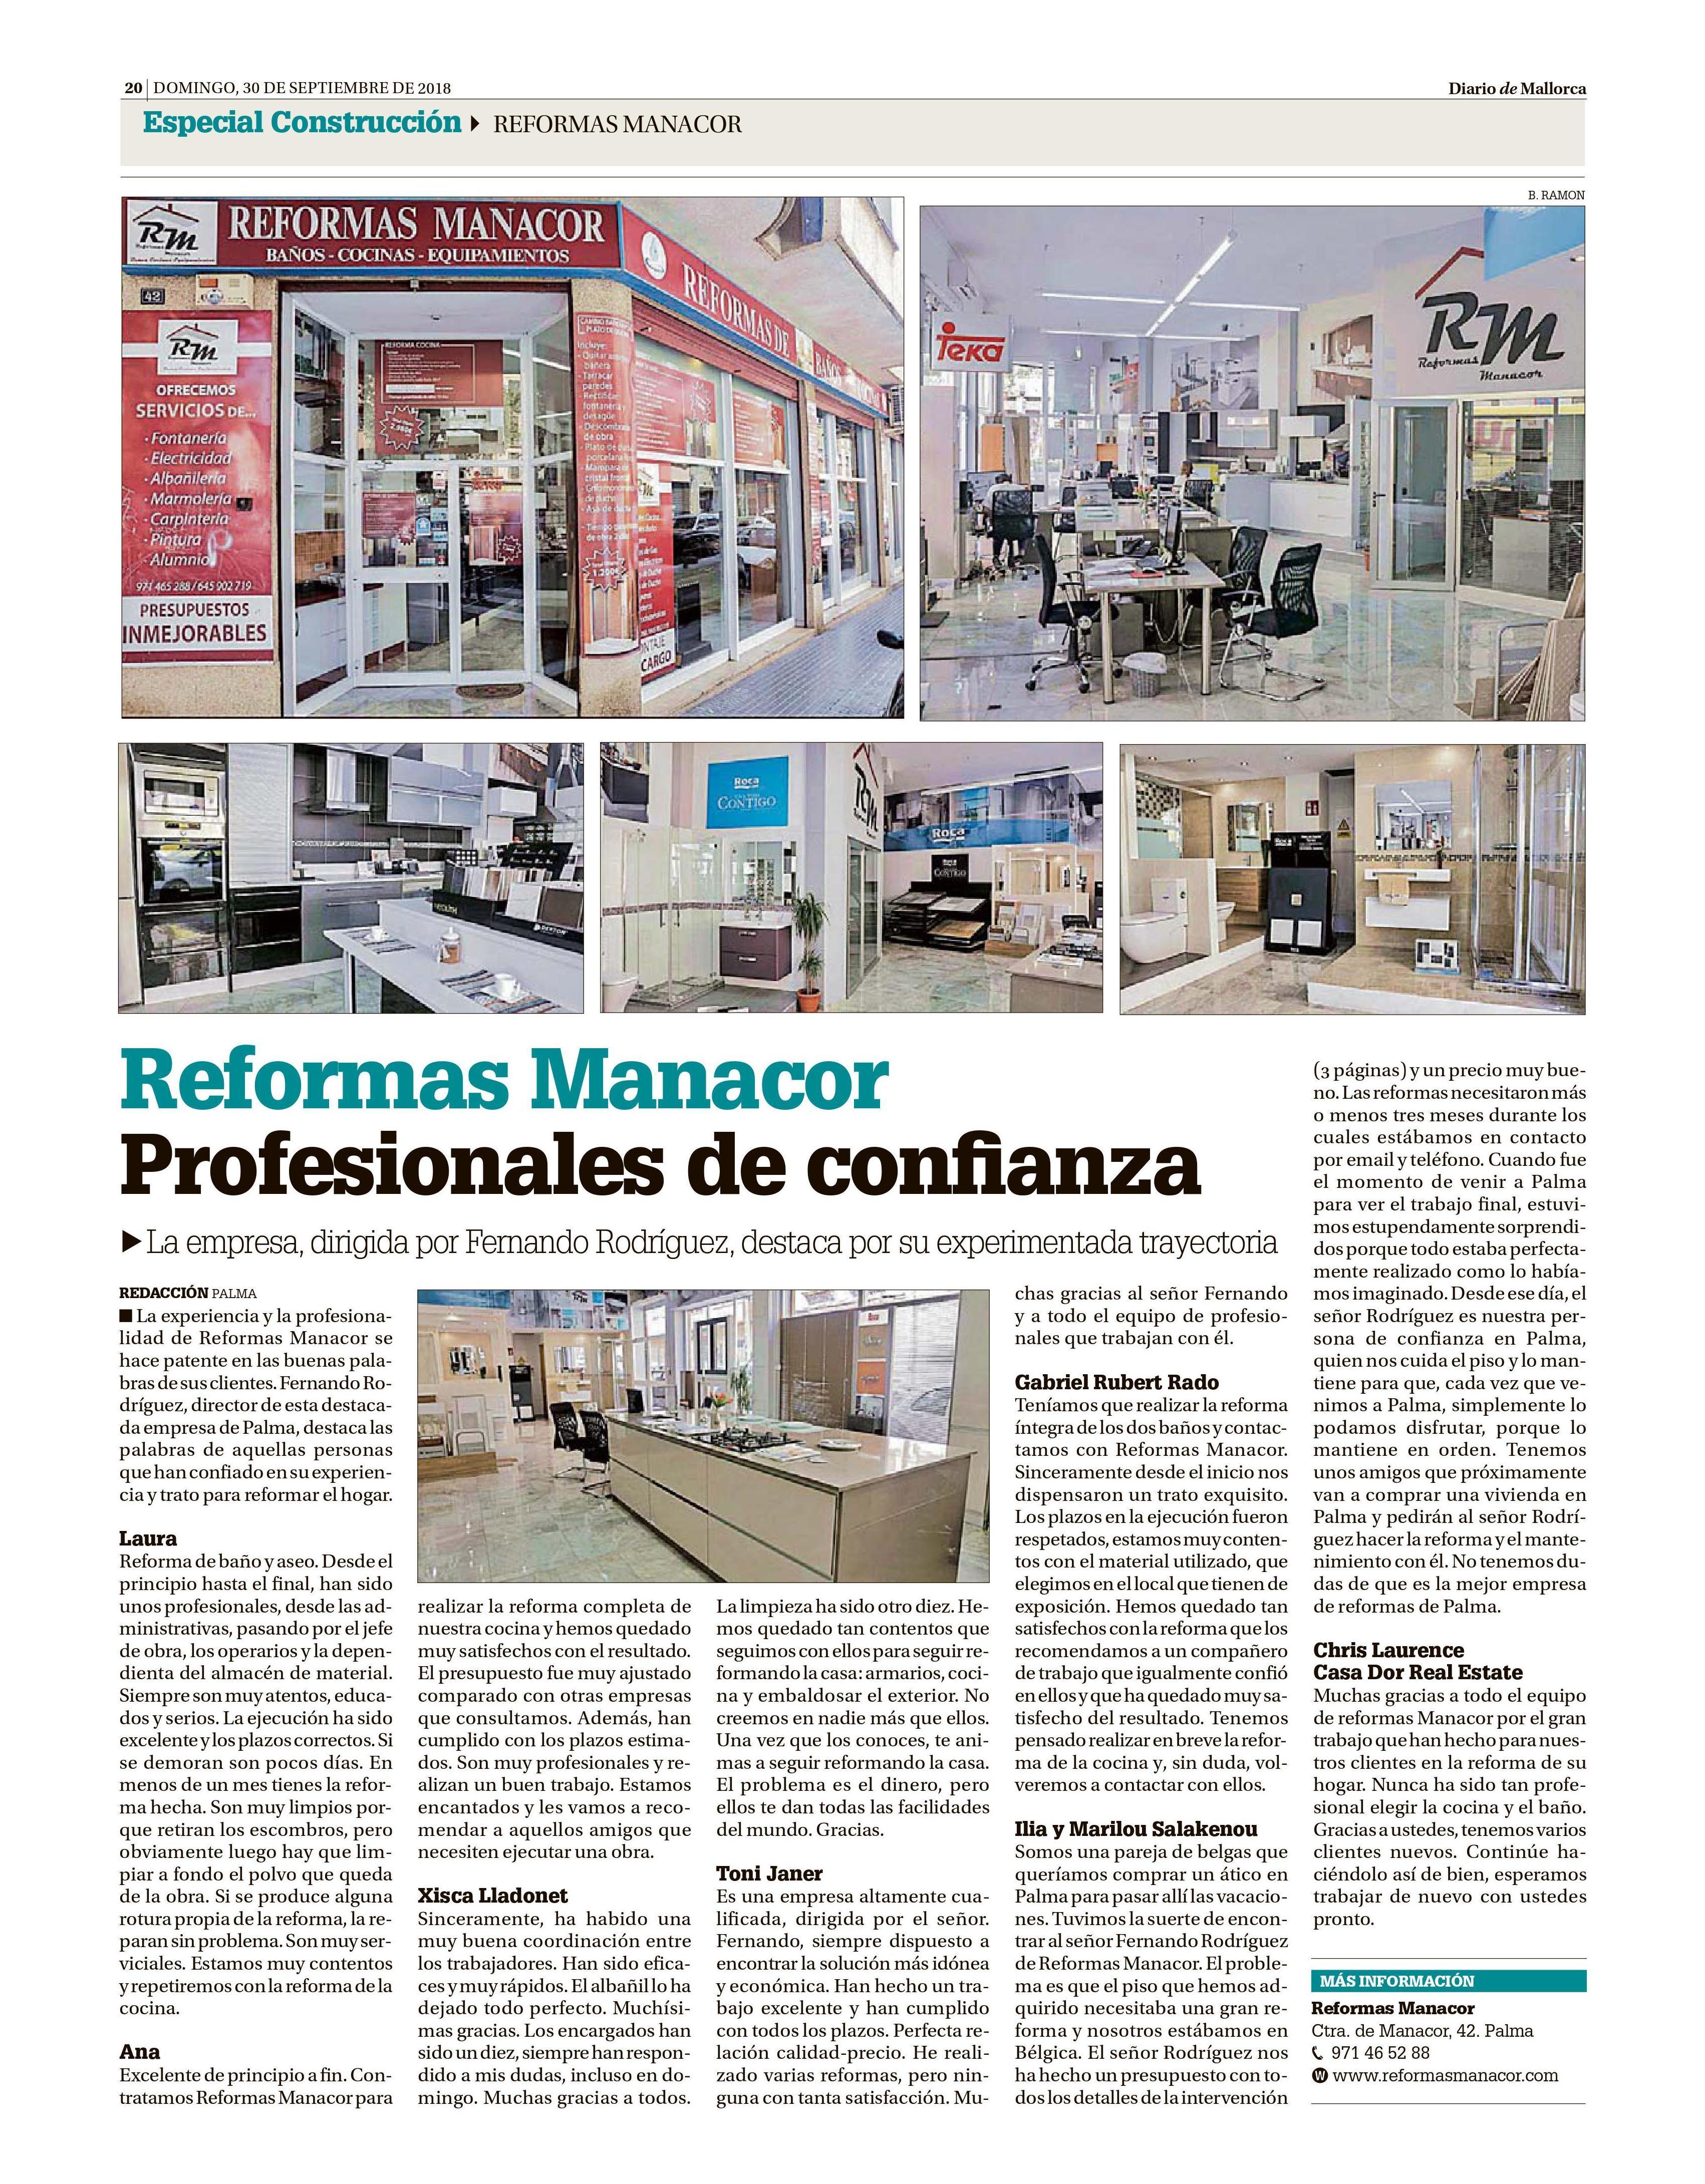 Especial Construcción Diario de Mallorca - Reformas Manacor